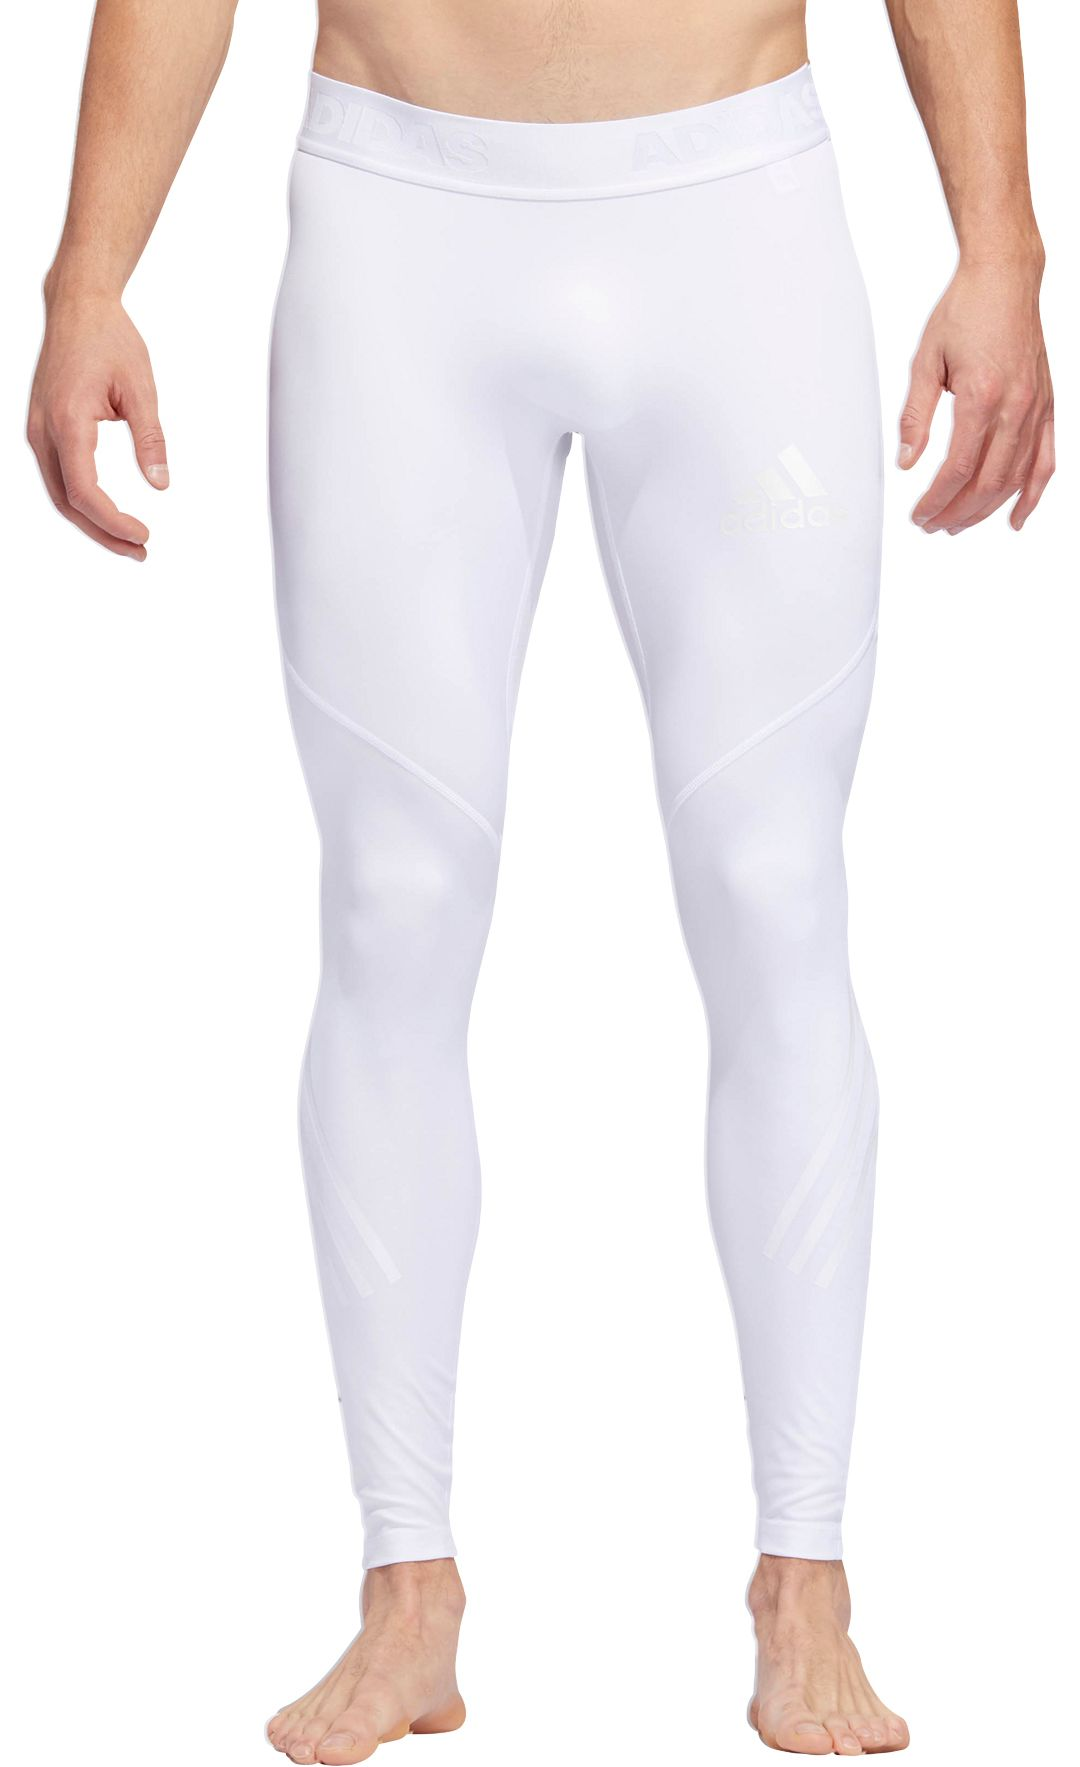 b01e8aeab326d9 adidas Men's Alphaskin Sport 3-Stripes Tights. noImageFound. Previous